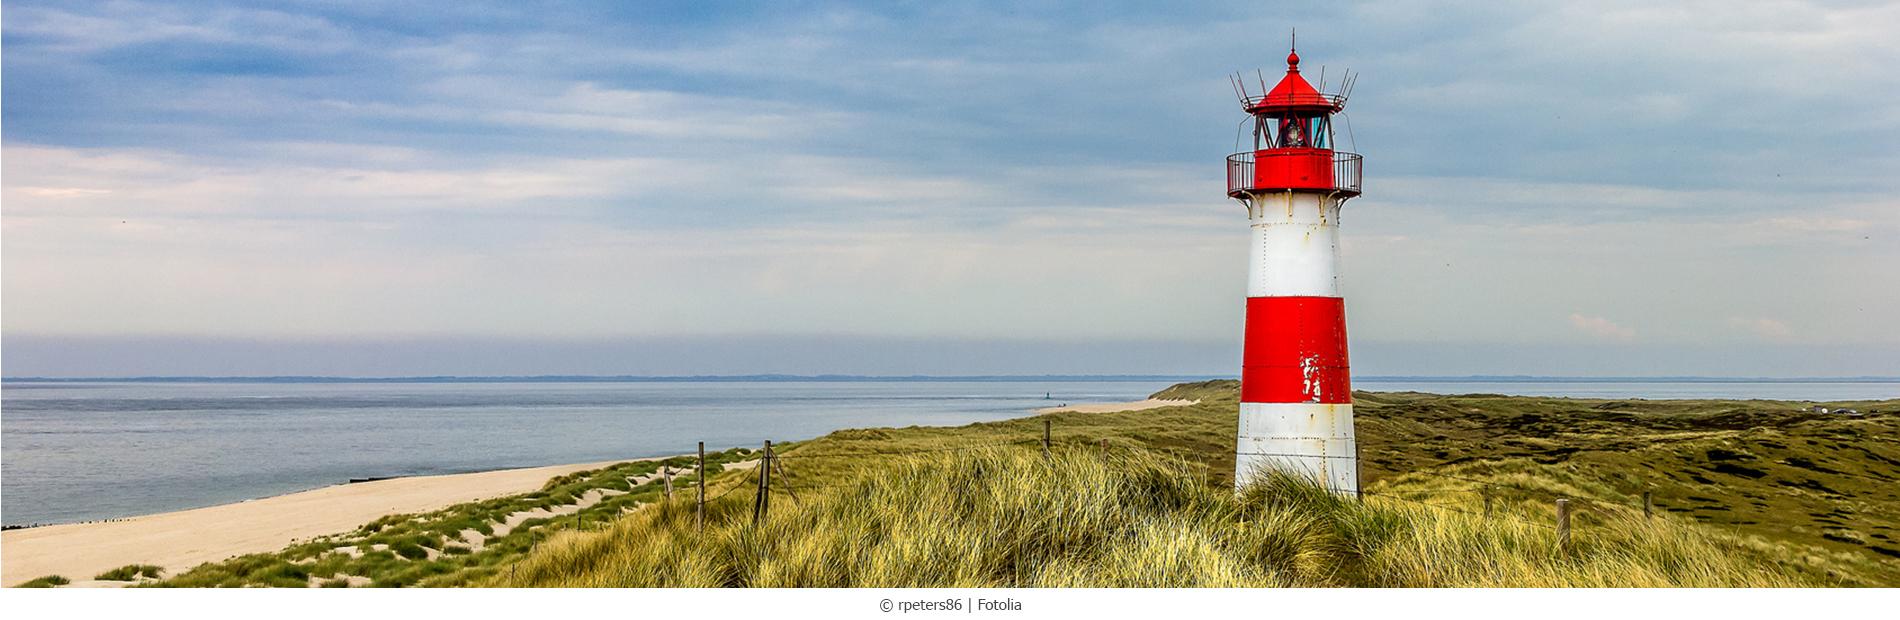 Helgoland_FotoliaM_webC